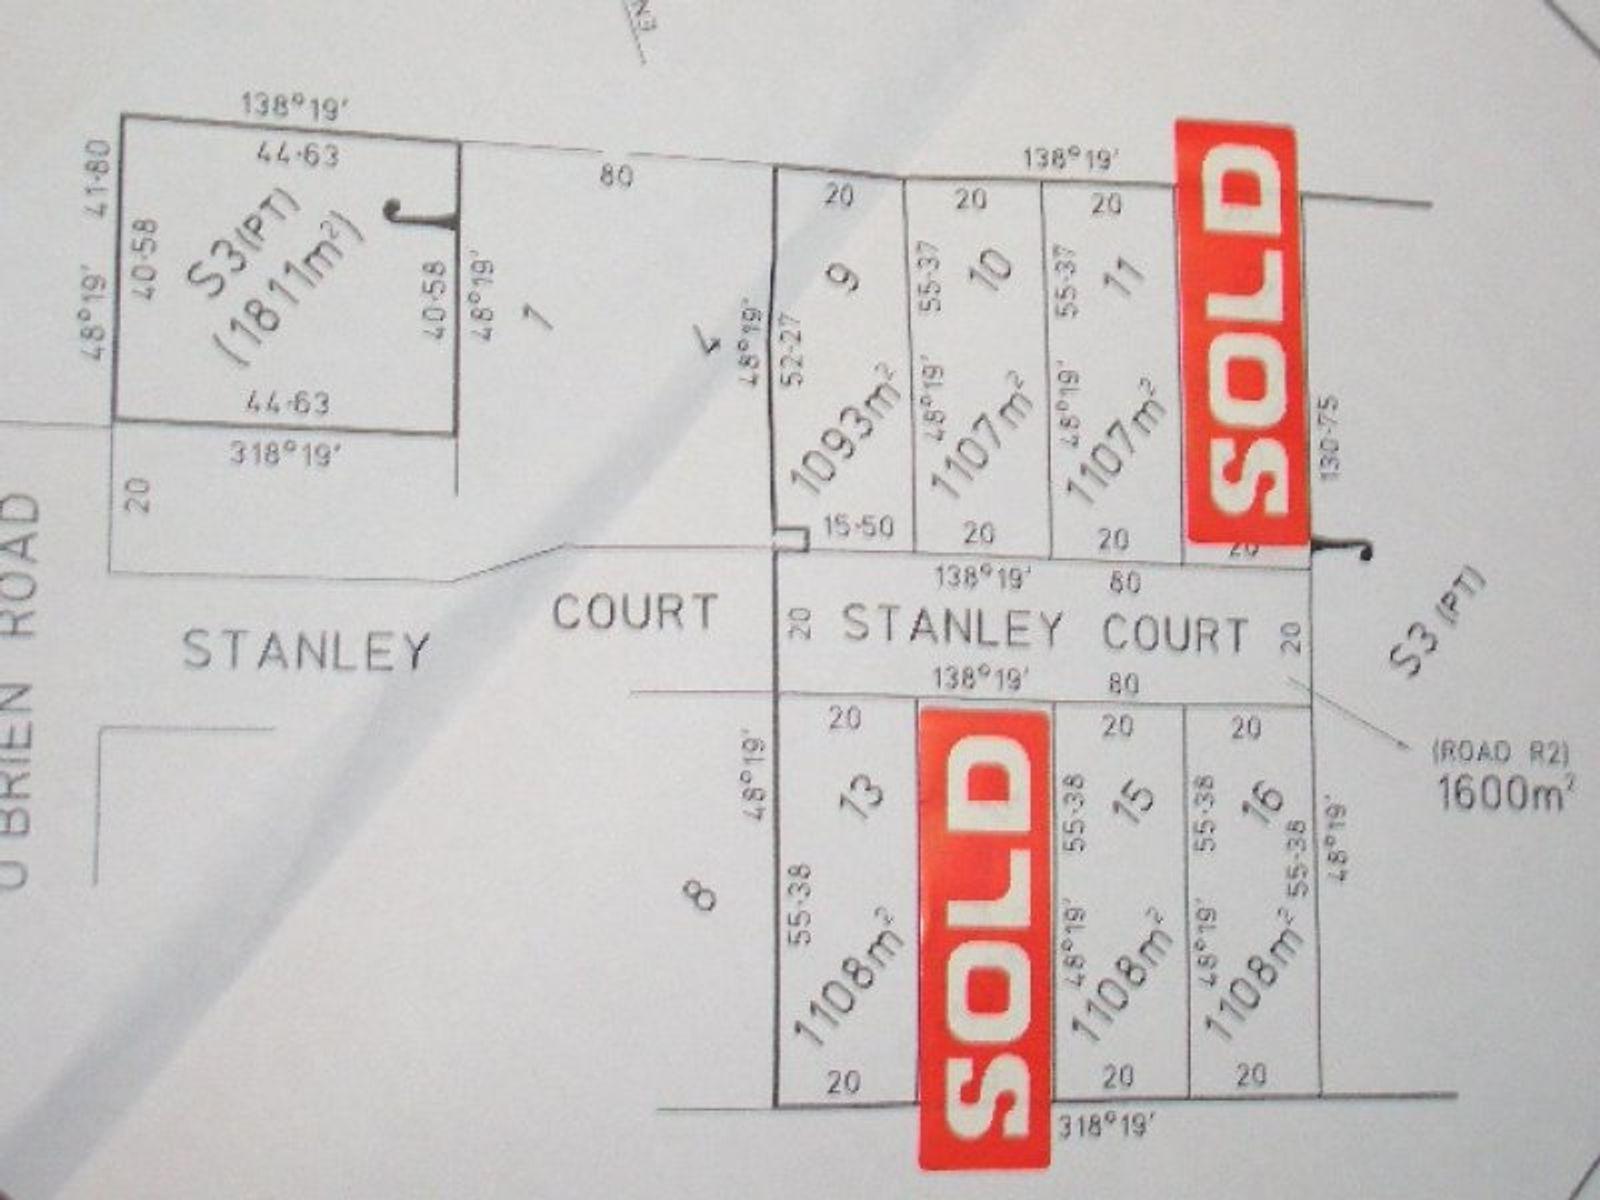 9 Stanley Court, Cohuna, VIC 3568